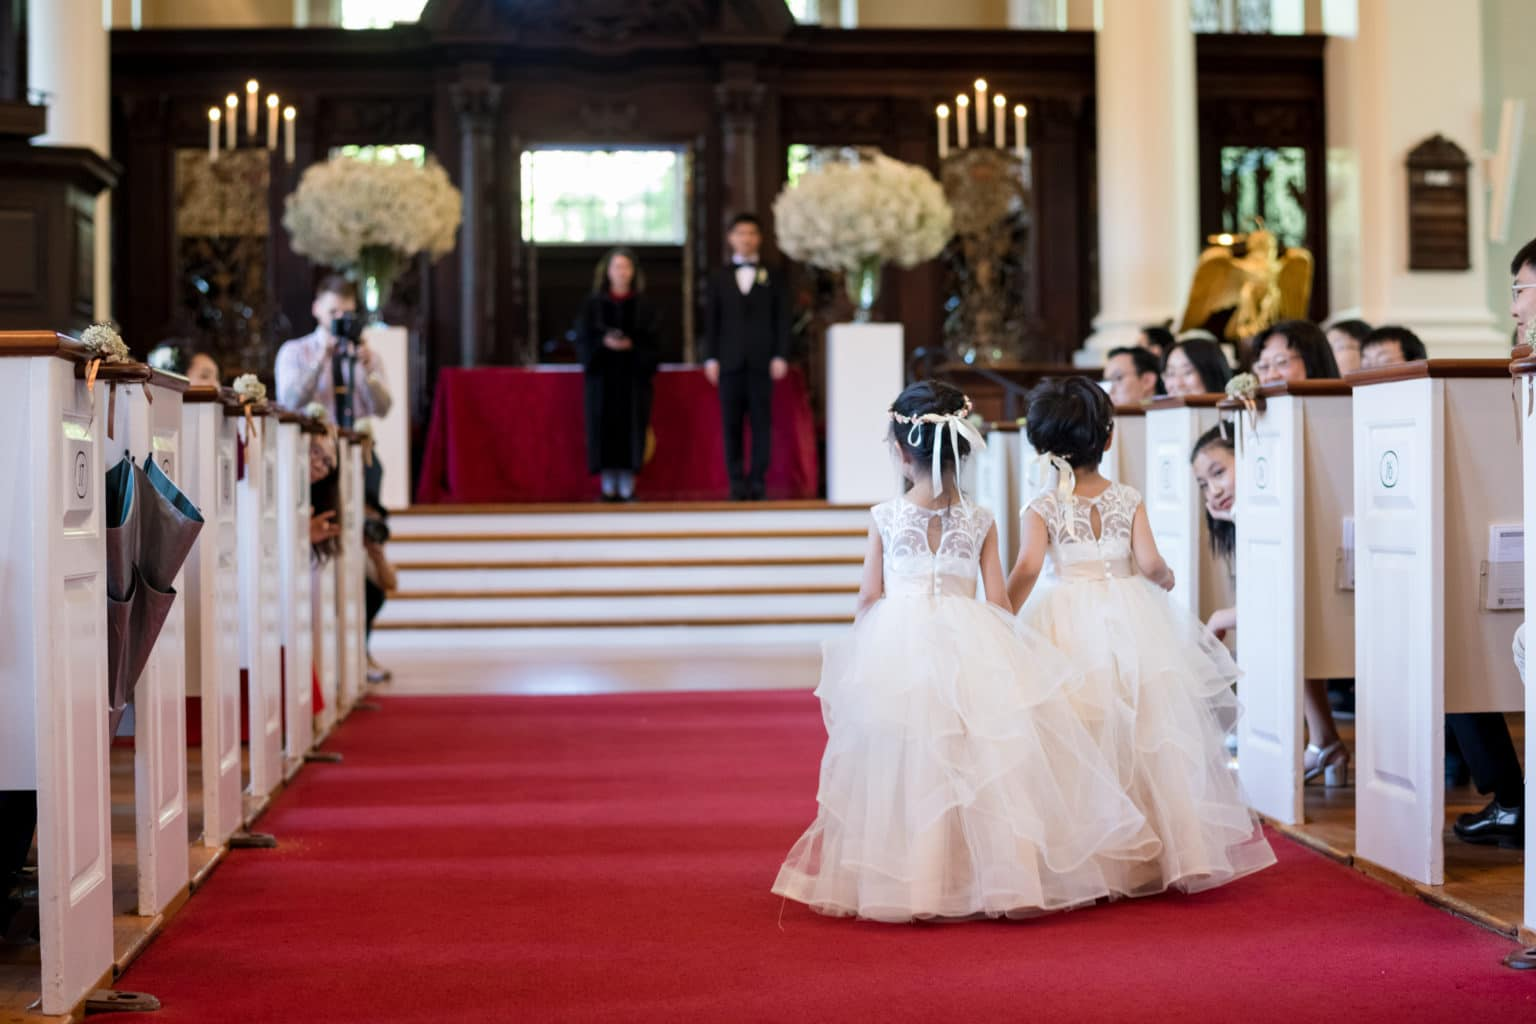 We are sharing our 2019 best wedding designs from the year. Featuring Chancey Charm Boston. #weddingdesign #weddinginspiration #chanceycharmboston